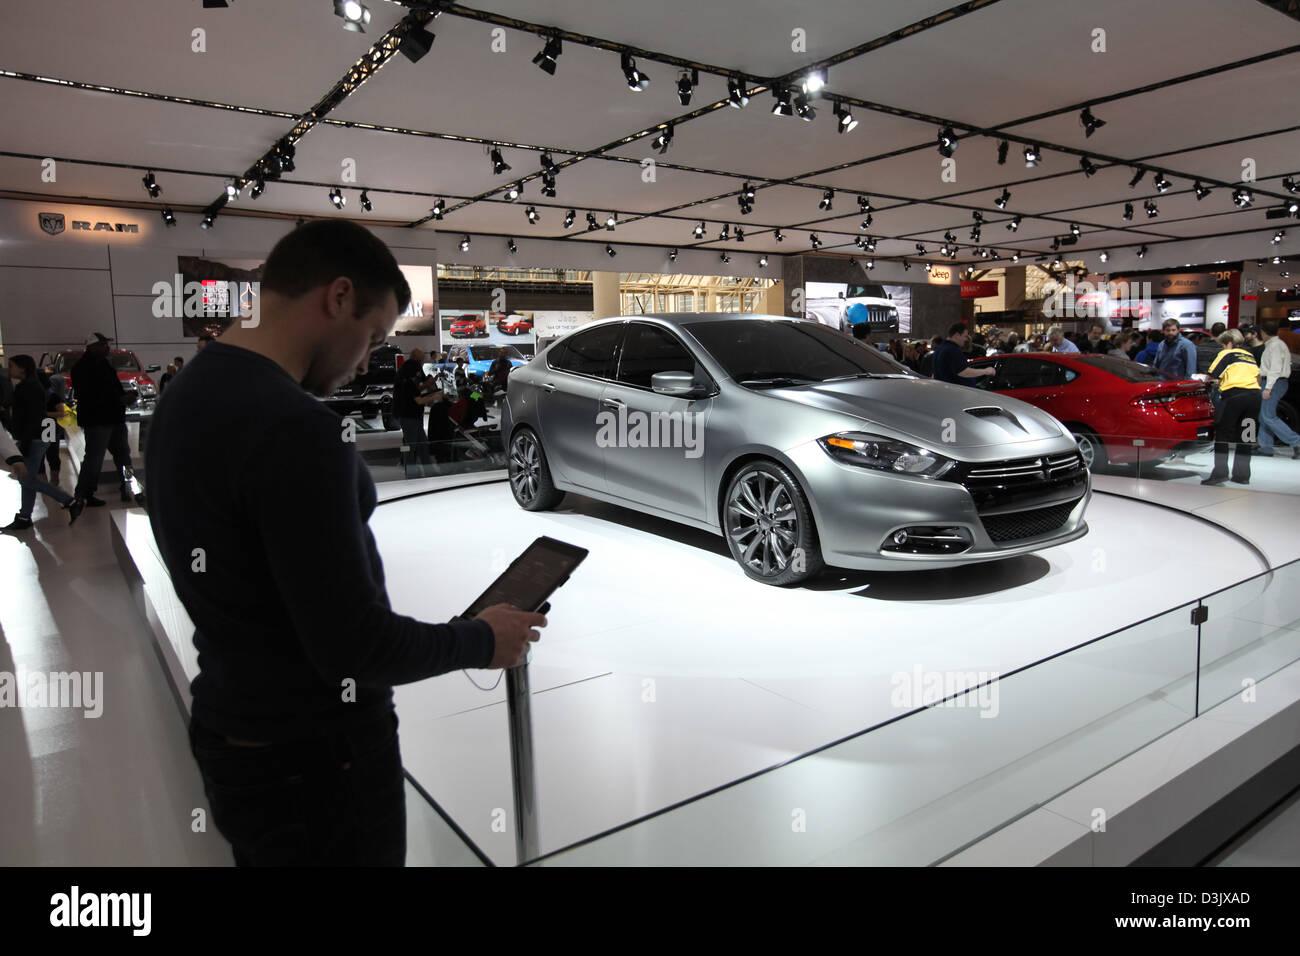 Male Auto Stockfotos & Male Auto Bilder - Alamy